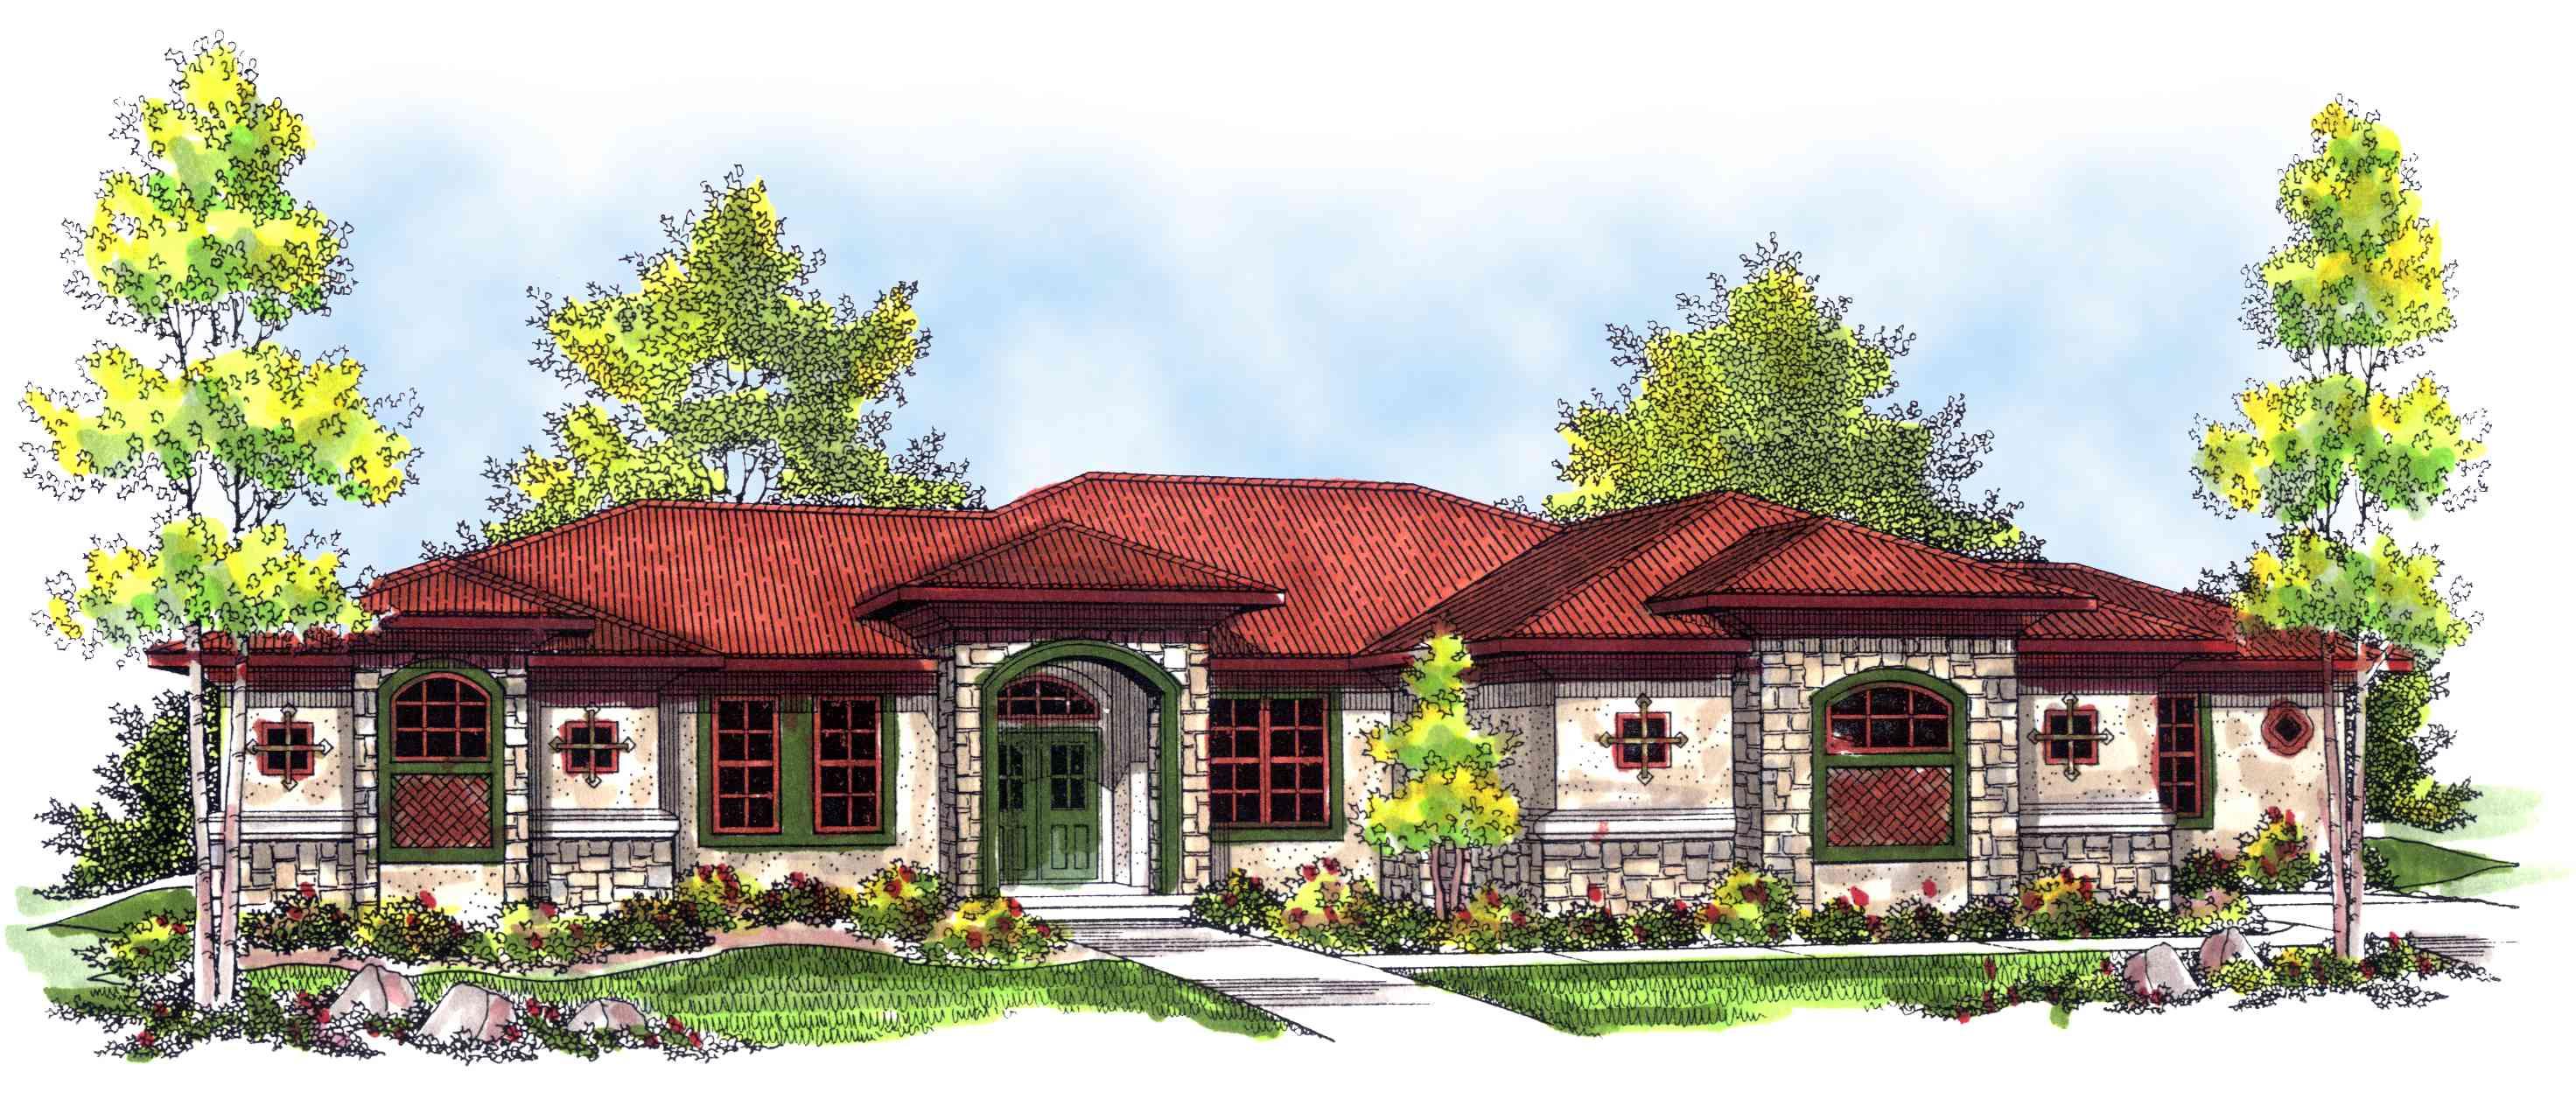 Mediterranean Ranch Home Plan 89311ah Architectural Designs House Plans